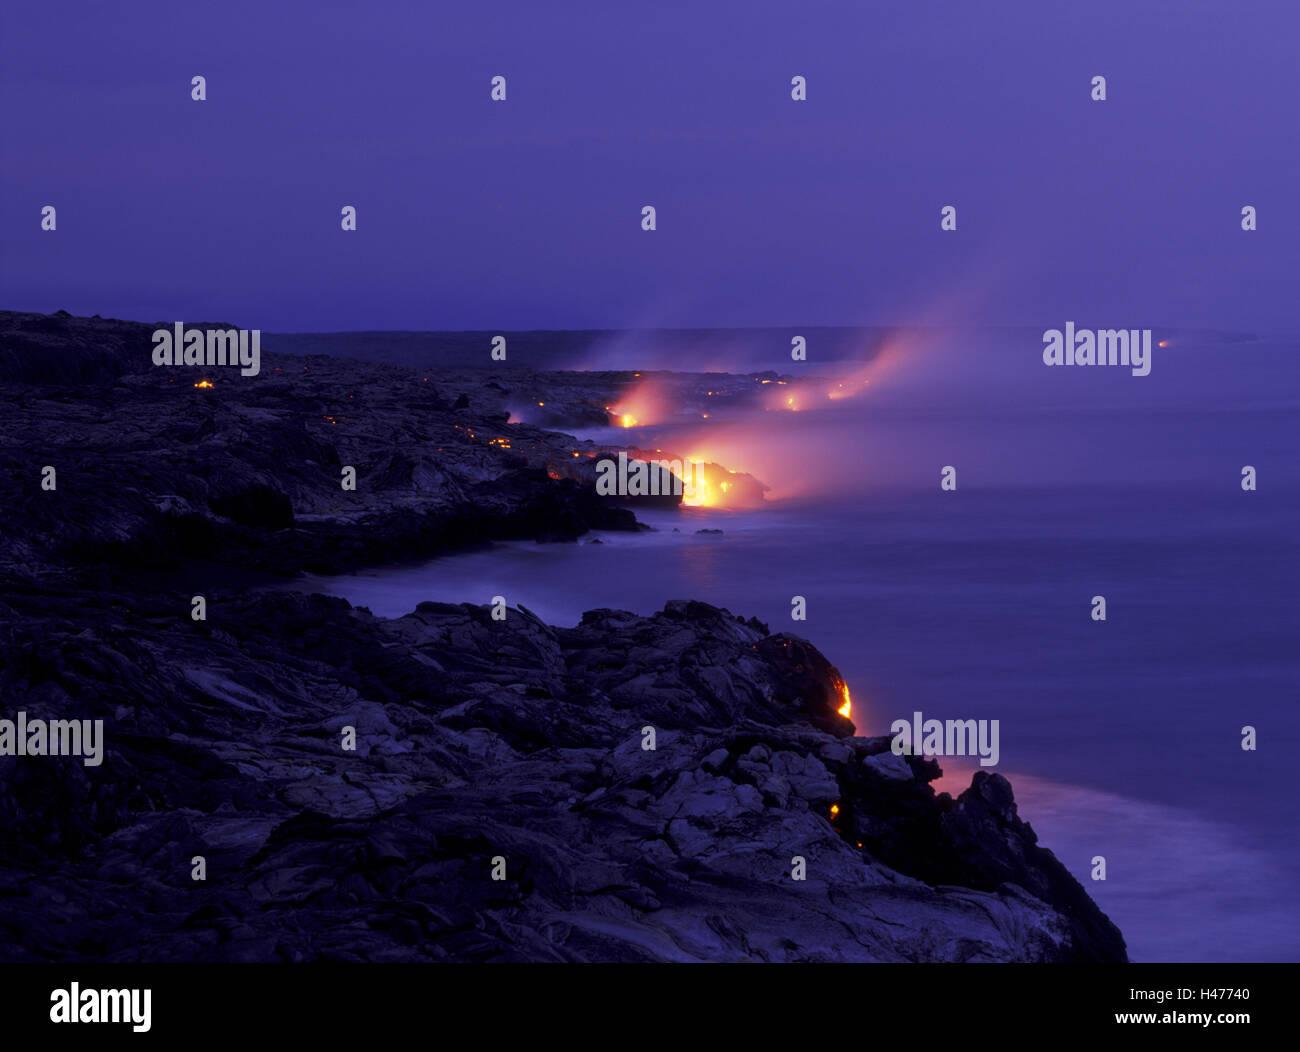 USA, Hawaii, Big Island, Hawaii Volcanoes National Park, East Rift Zone, lava flow, - Stock Image